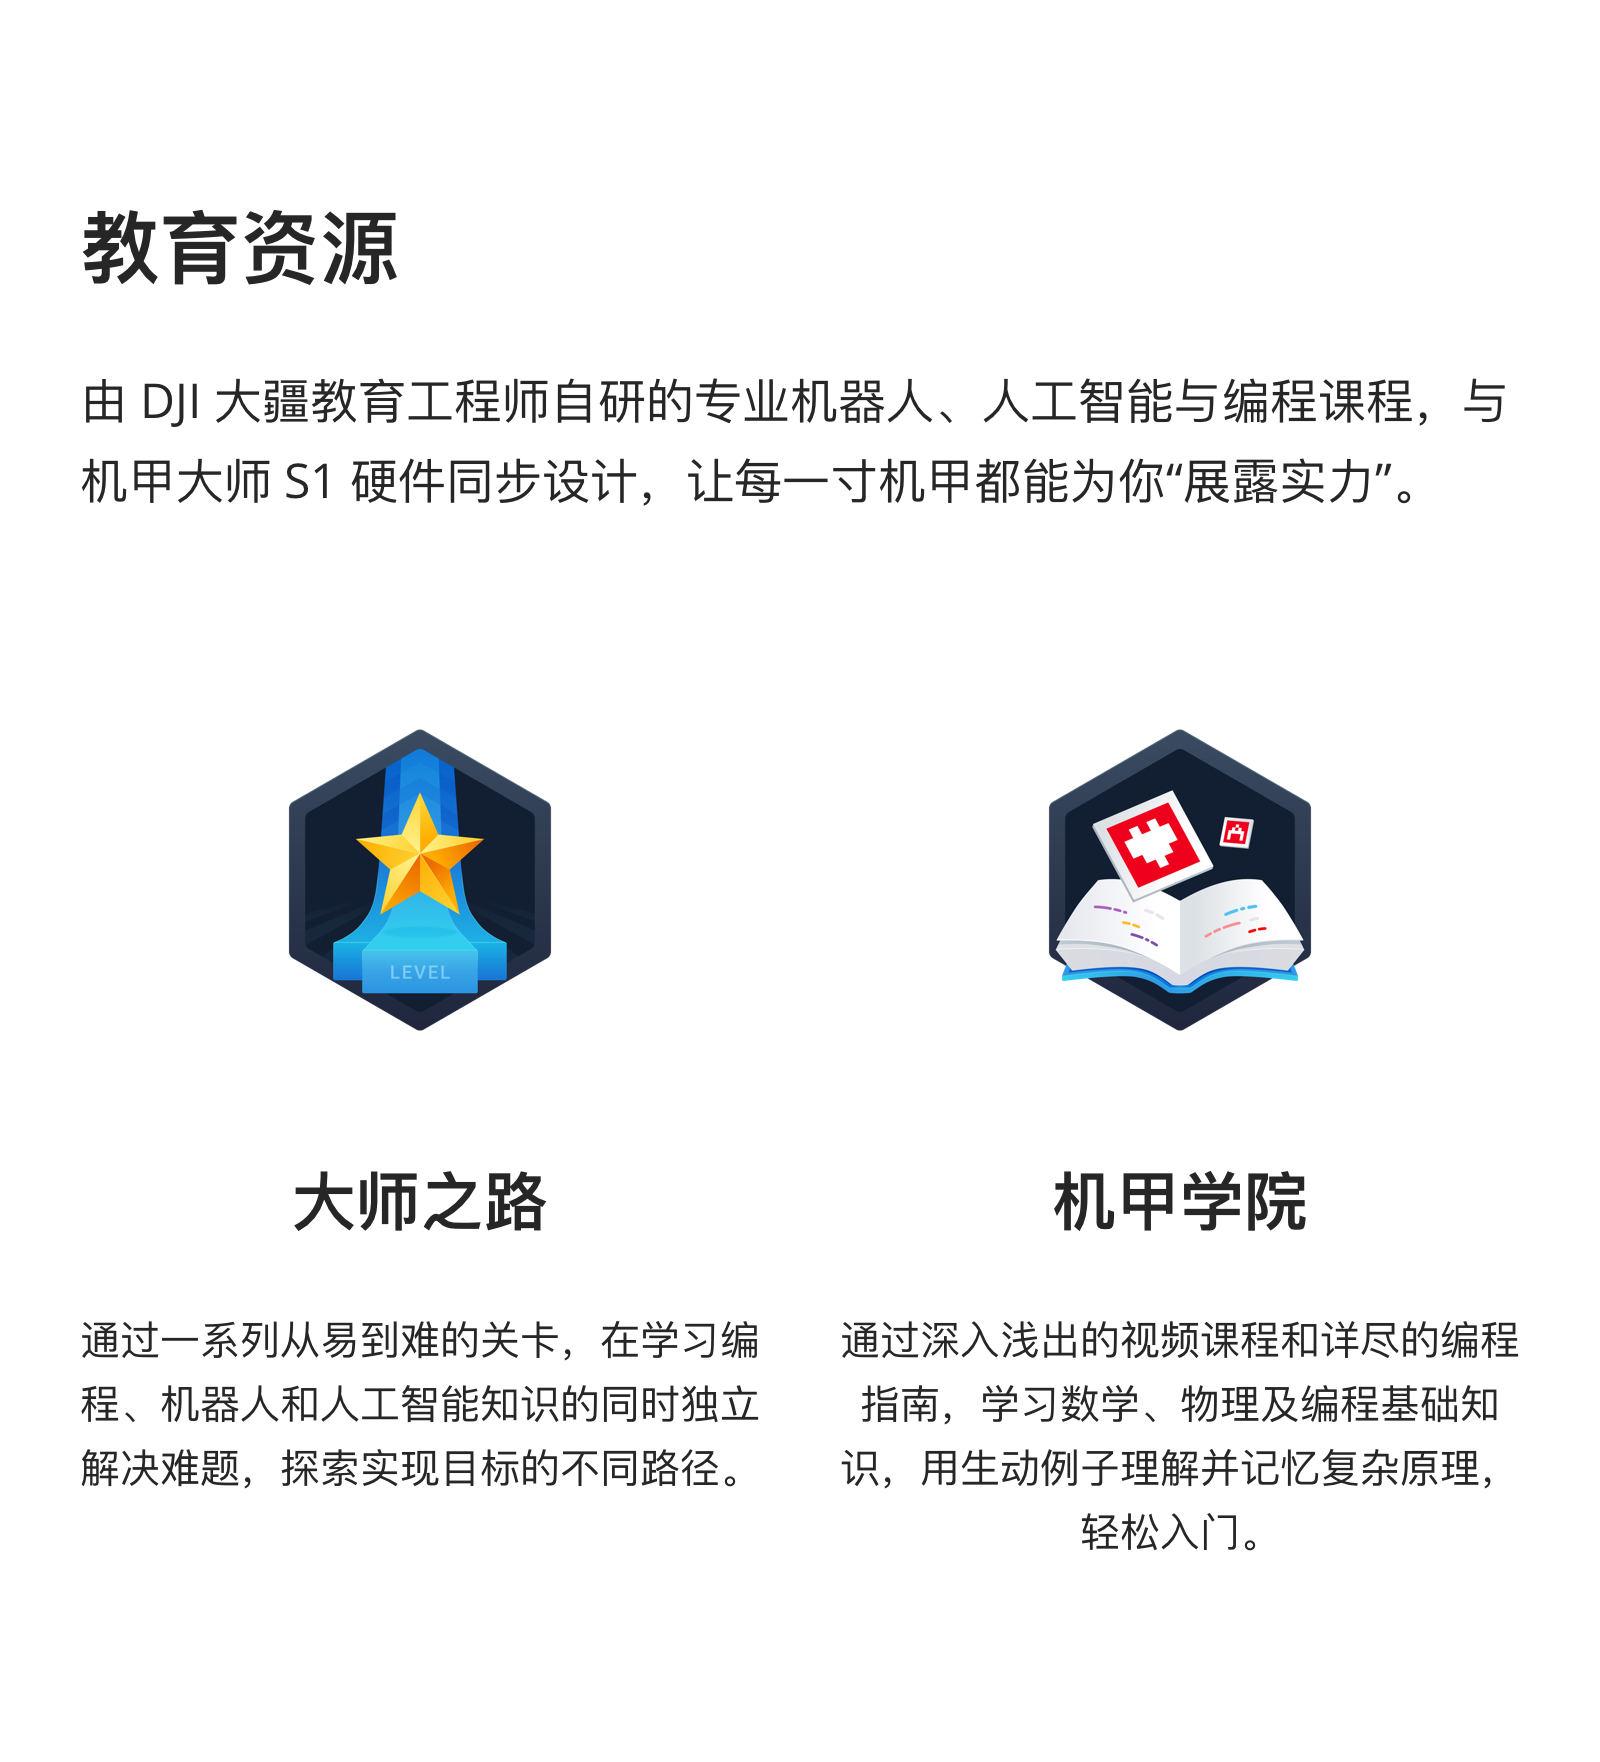 0607_store_PC_cn_08@2x.jpg